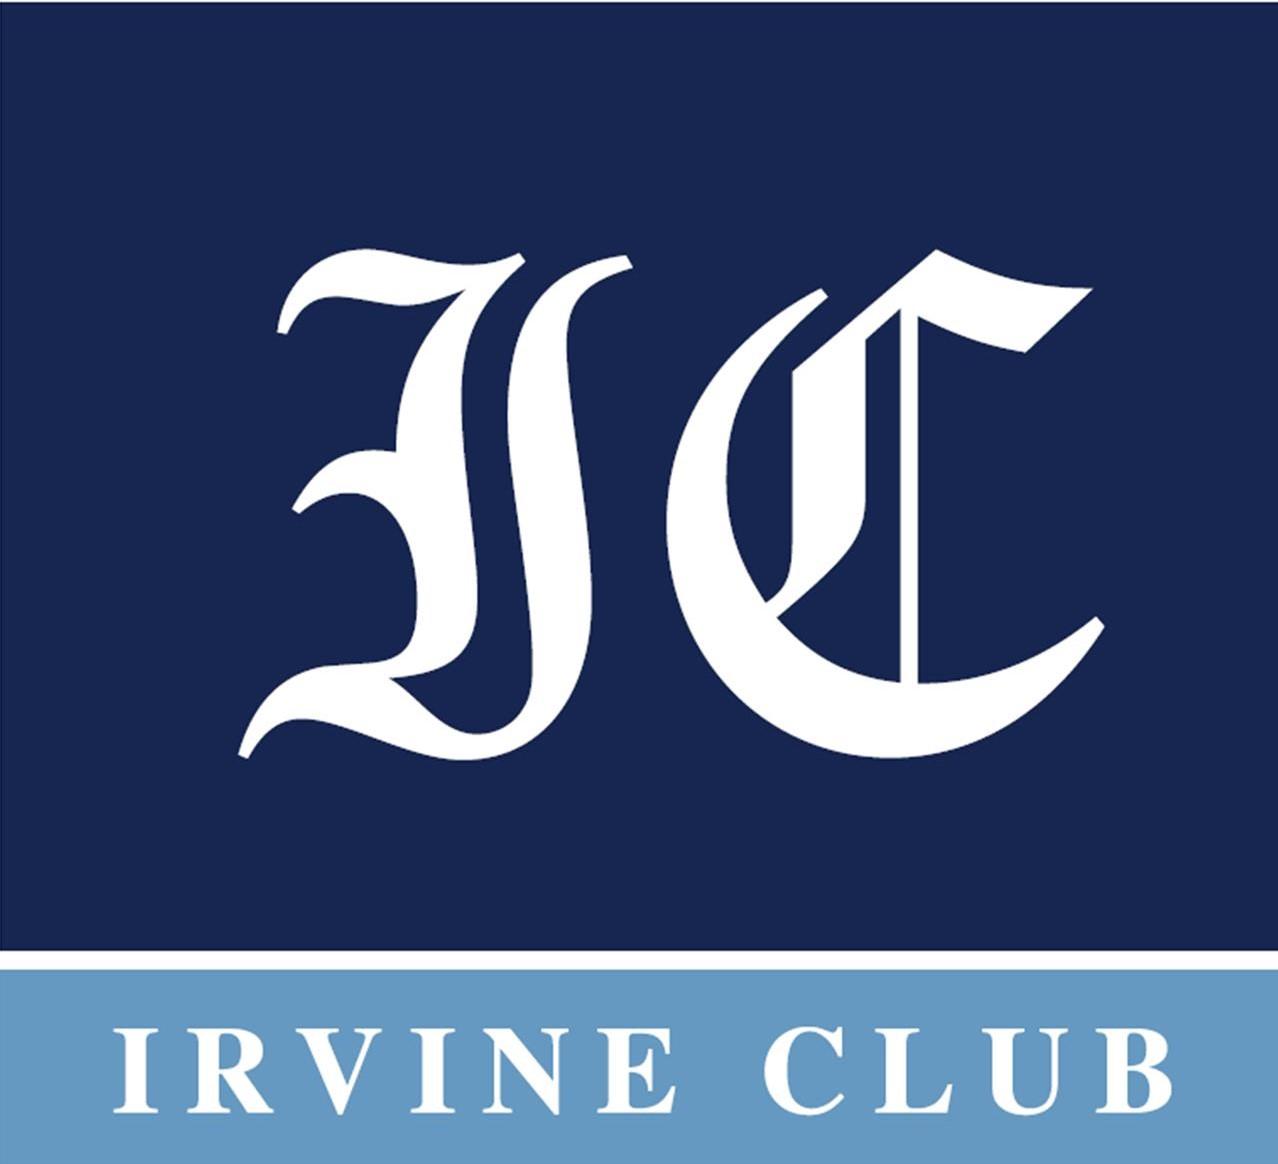 Irvine Club